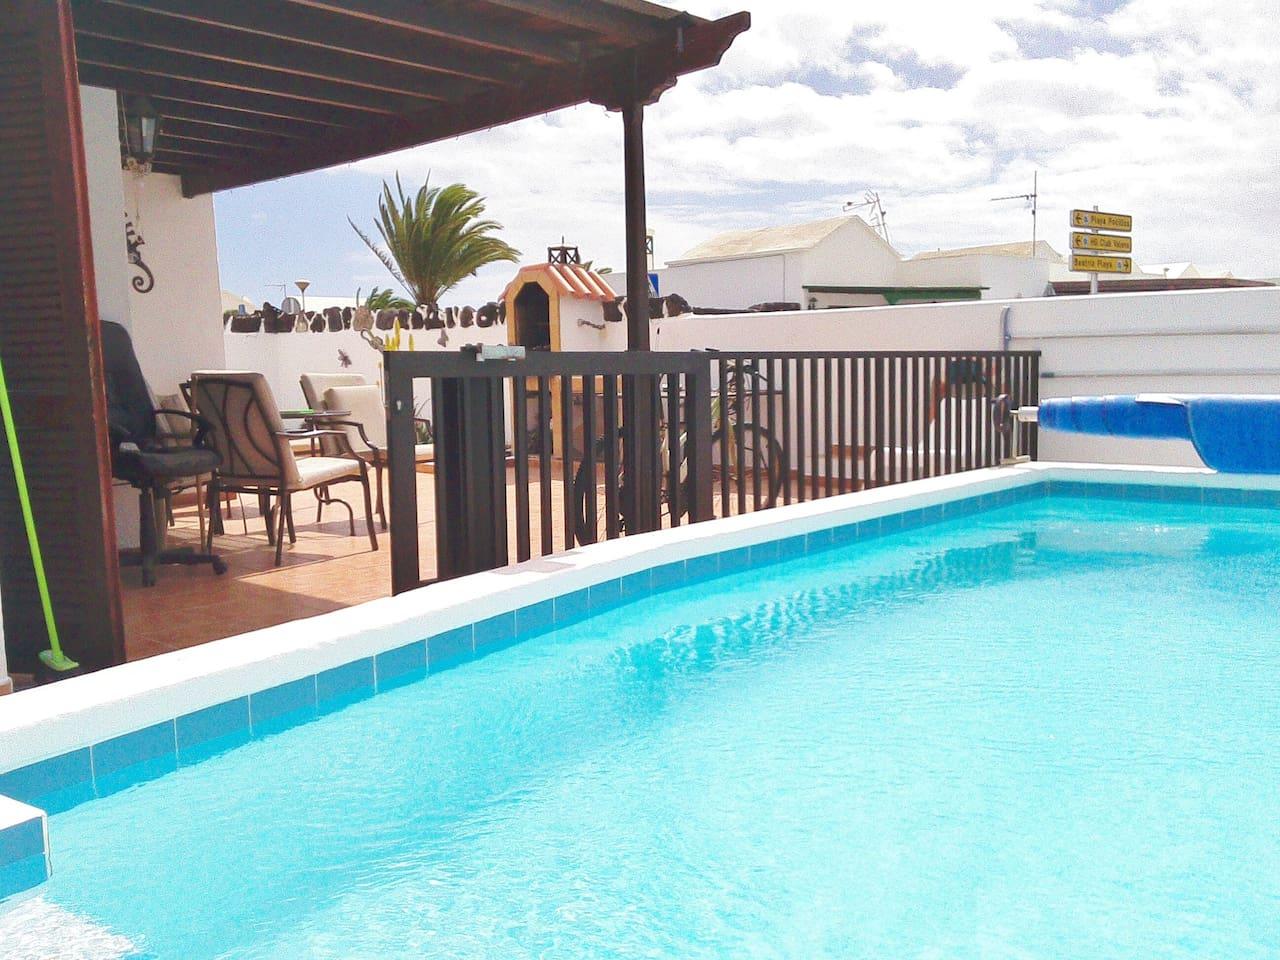 Solar heated & acclimatized pool - roman steps & grab rails for easy access